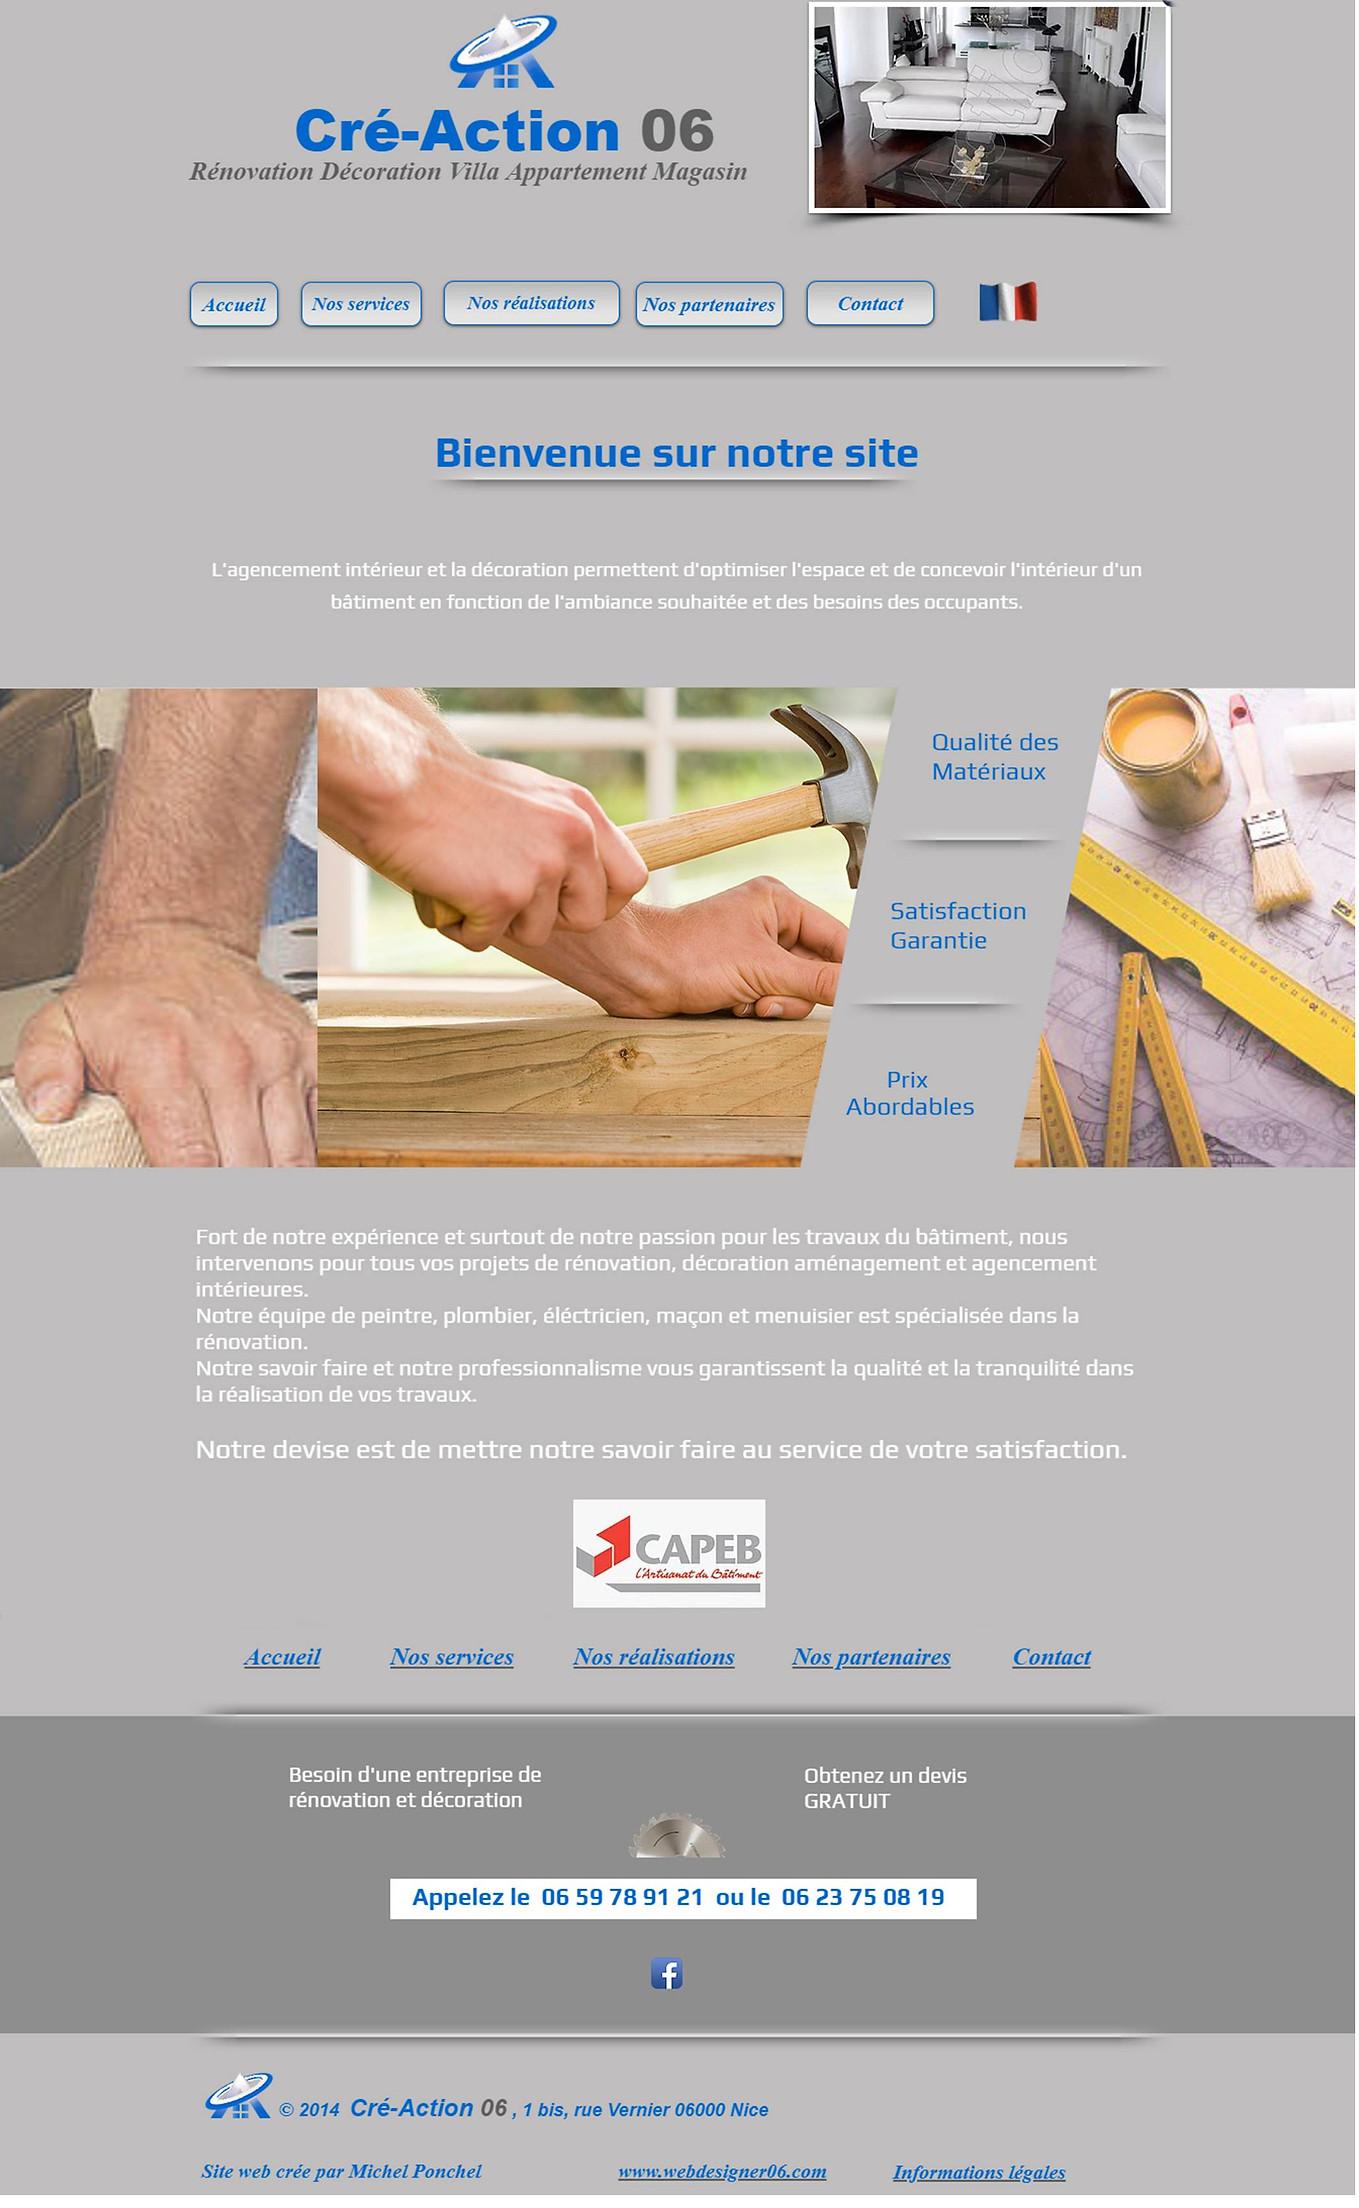 Cré-Action06 by Webdesigner06